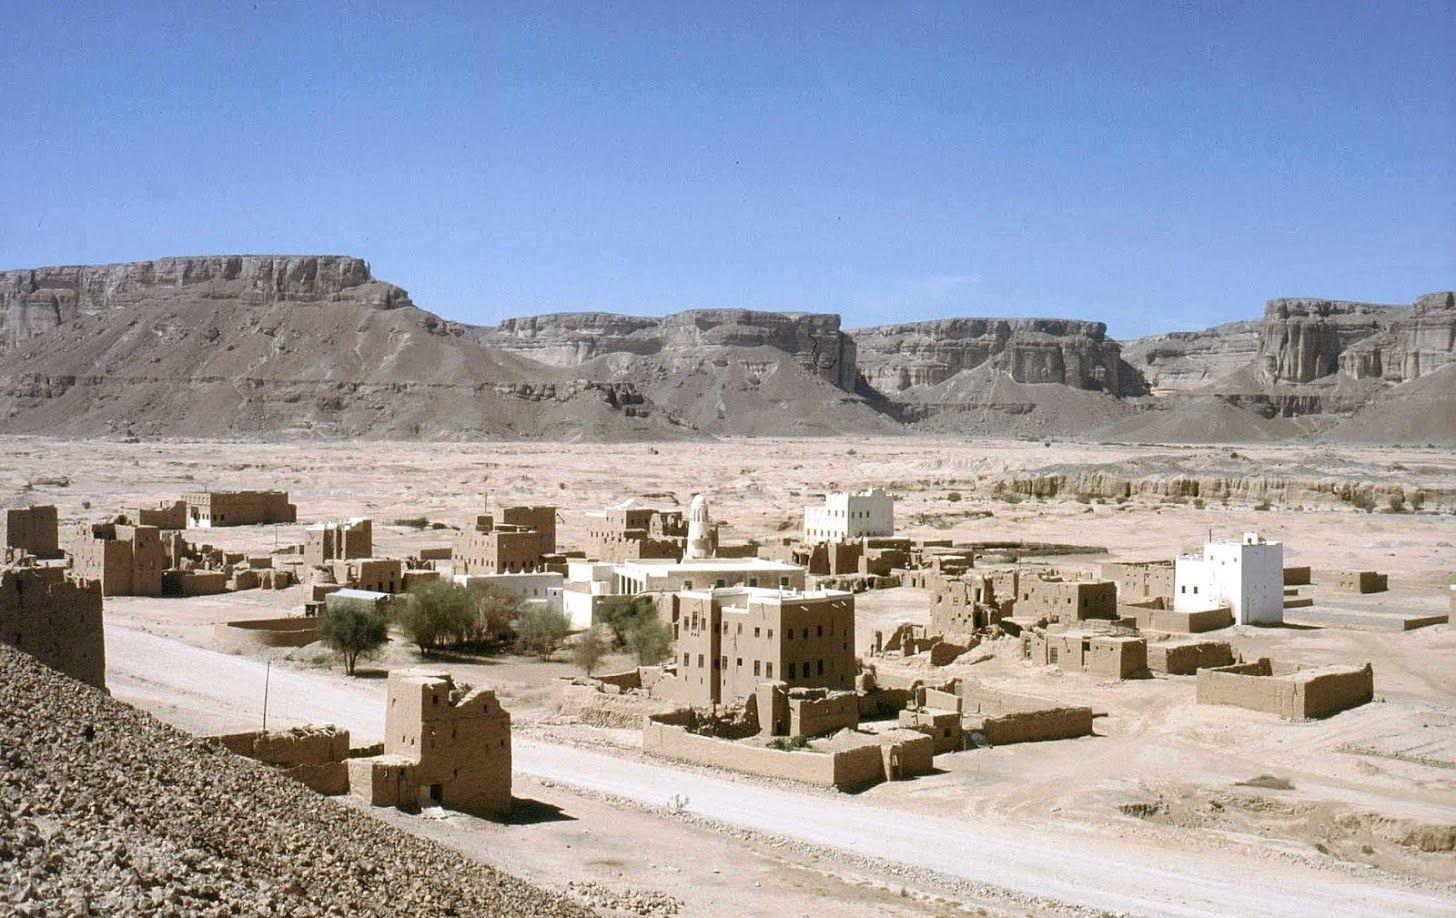 Al Masshad - Wadi Do'an